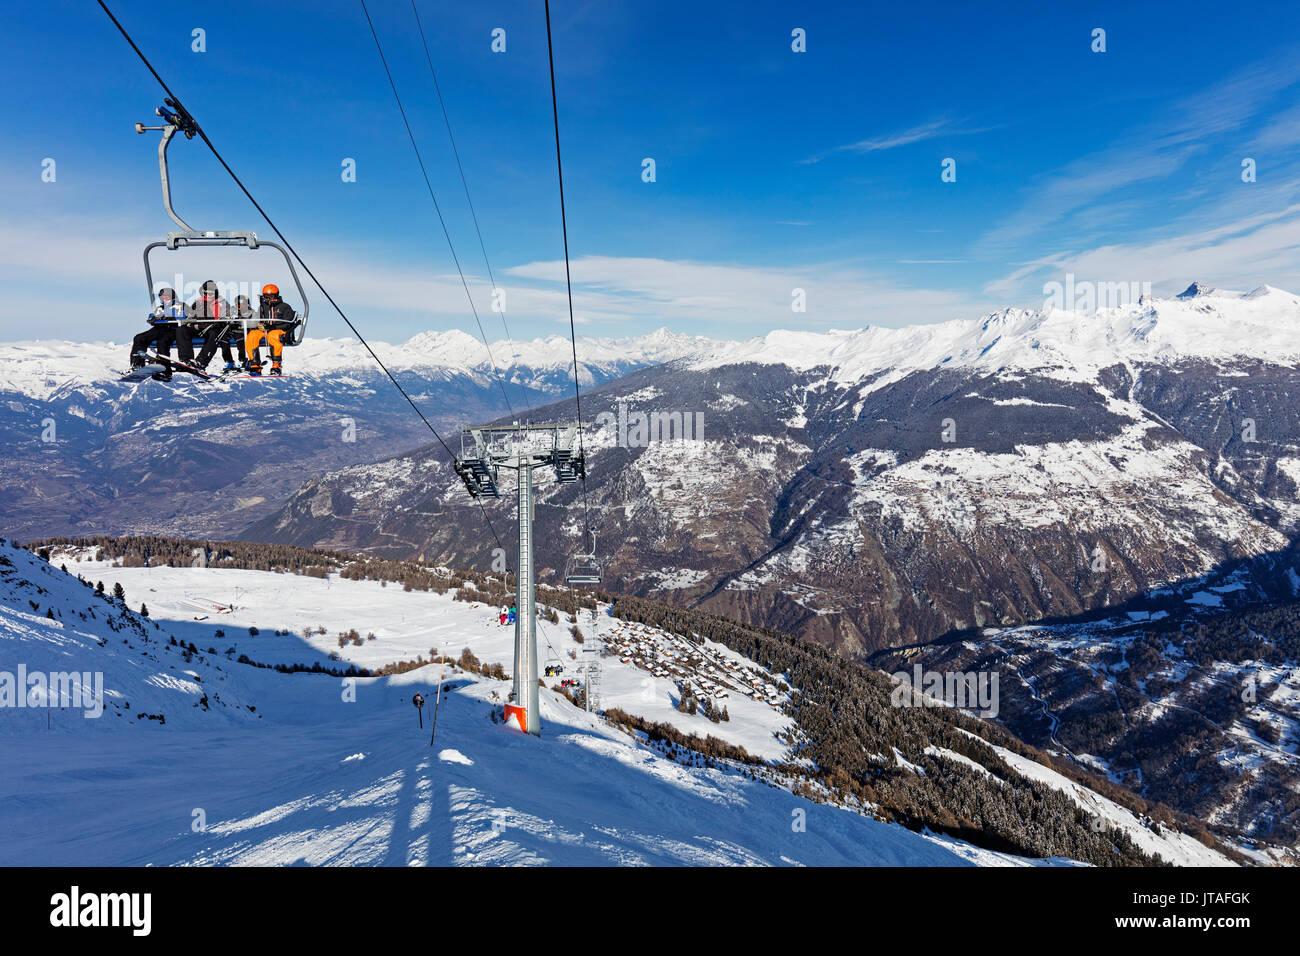 Skiers on a chair lift, Veysonnaz (Verbier), 4 Vallees, Valais, Swiss Alps, Switzerland, Europe - Stock Image